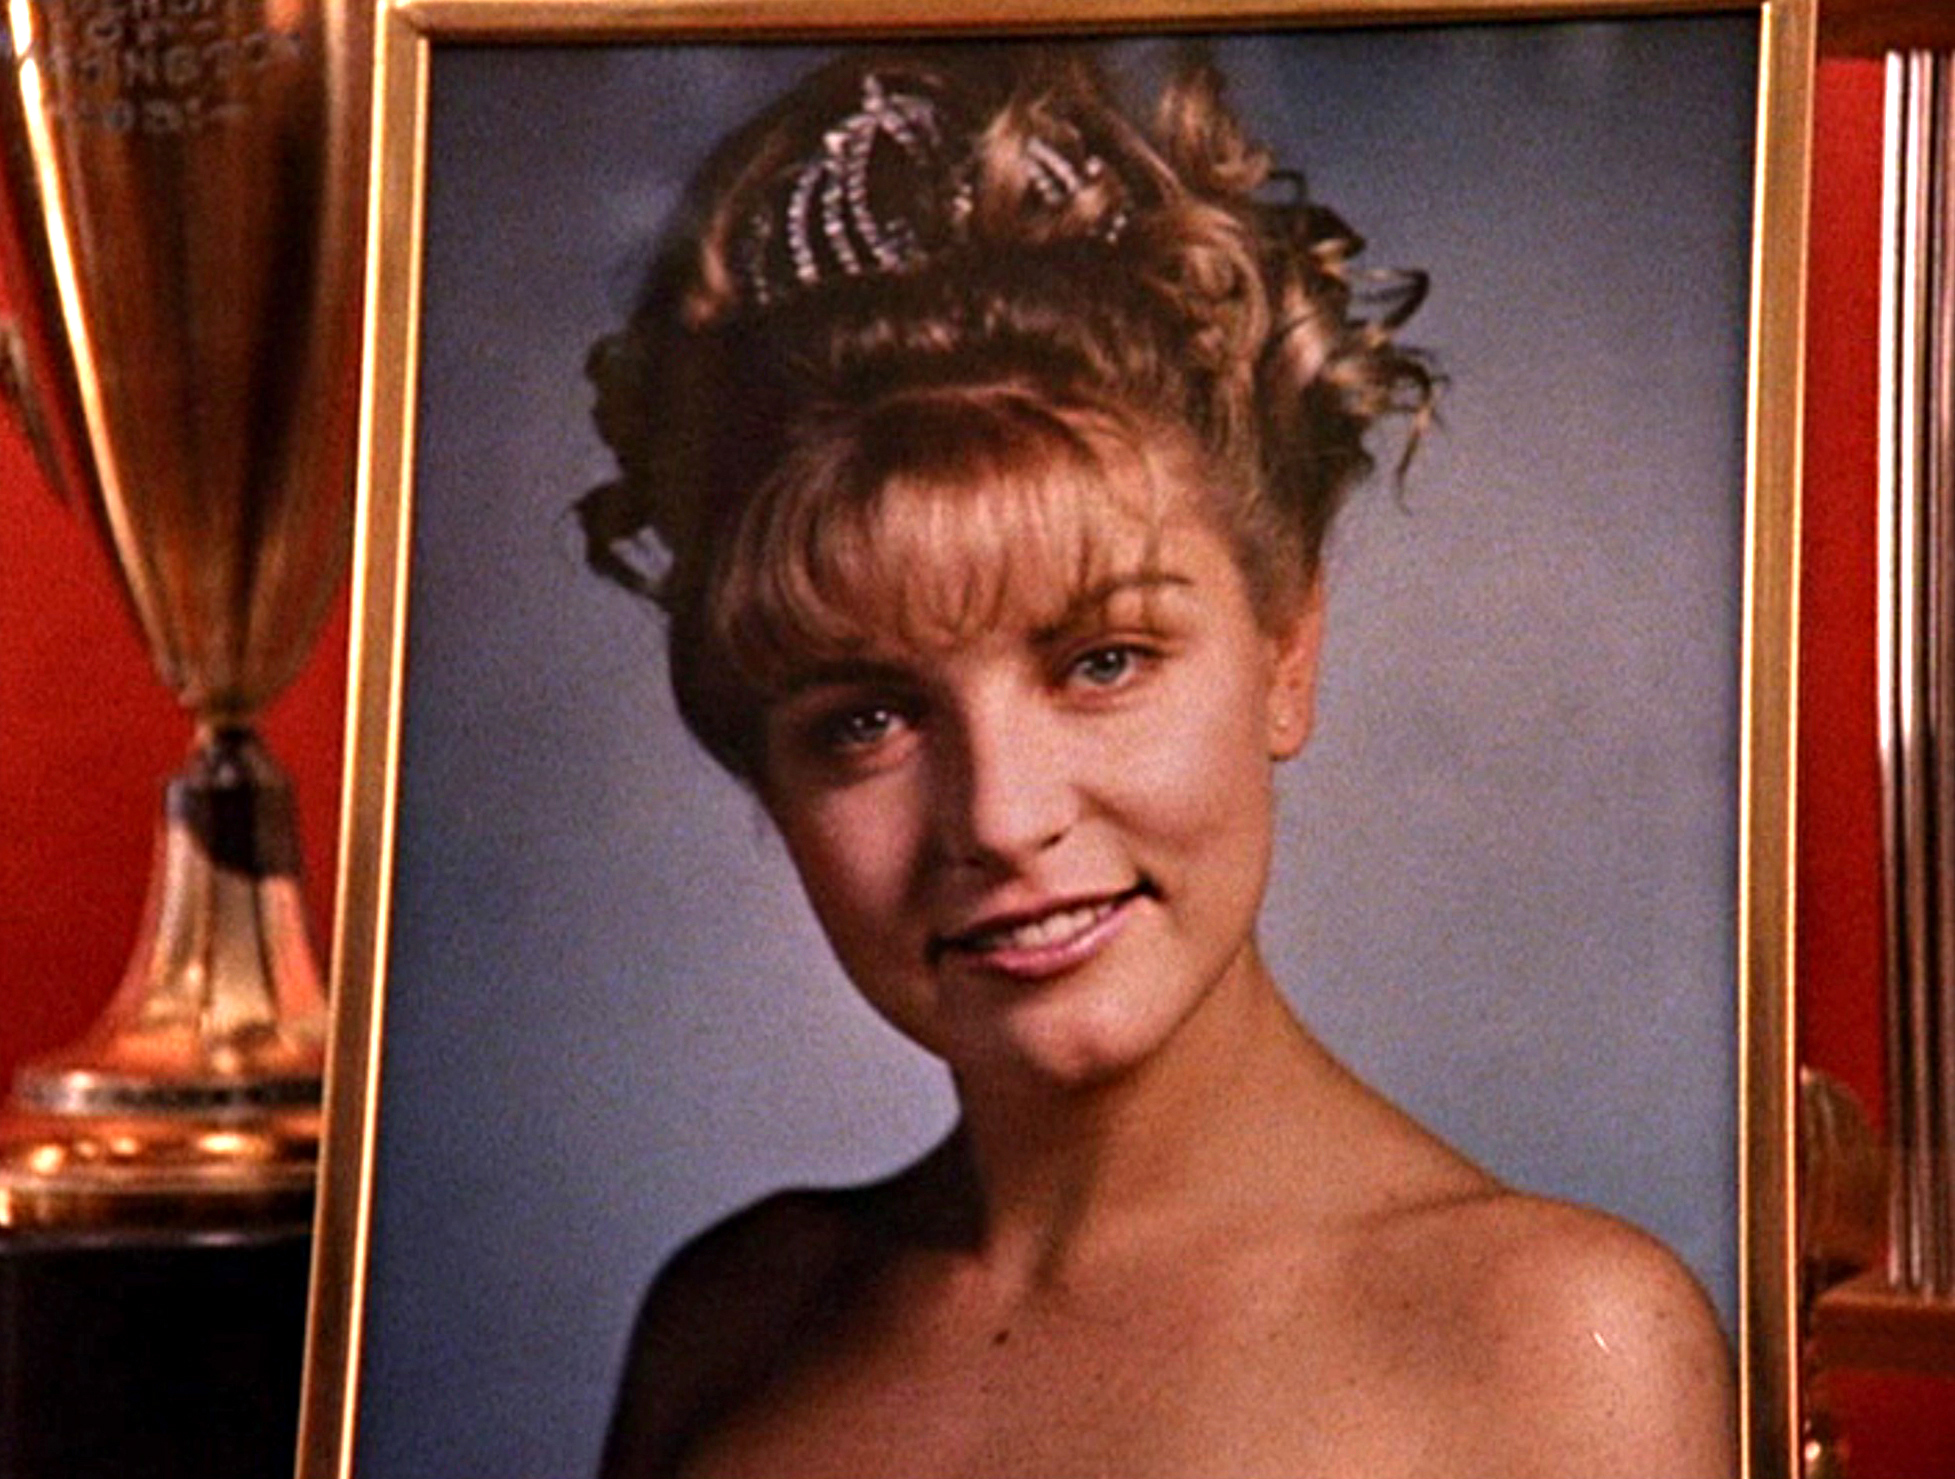 """Blonde, Beautiful And Dead"": Mord, der ""Twin Peaks"" inspirierte, erhält eigene Dokumentation"